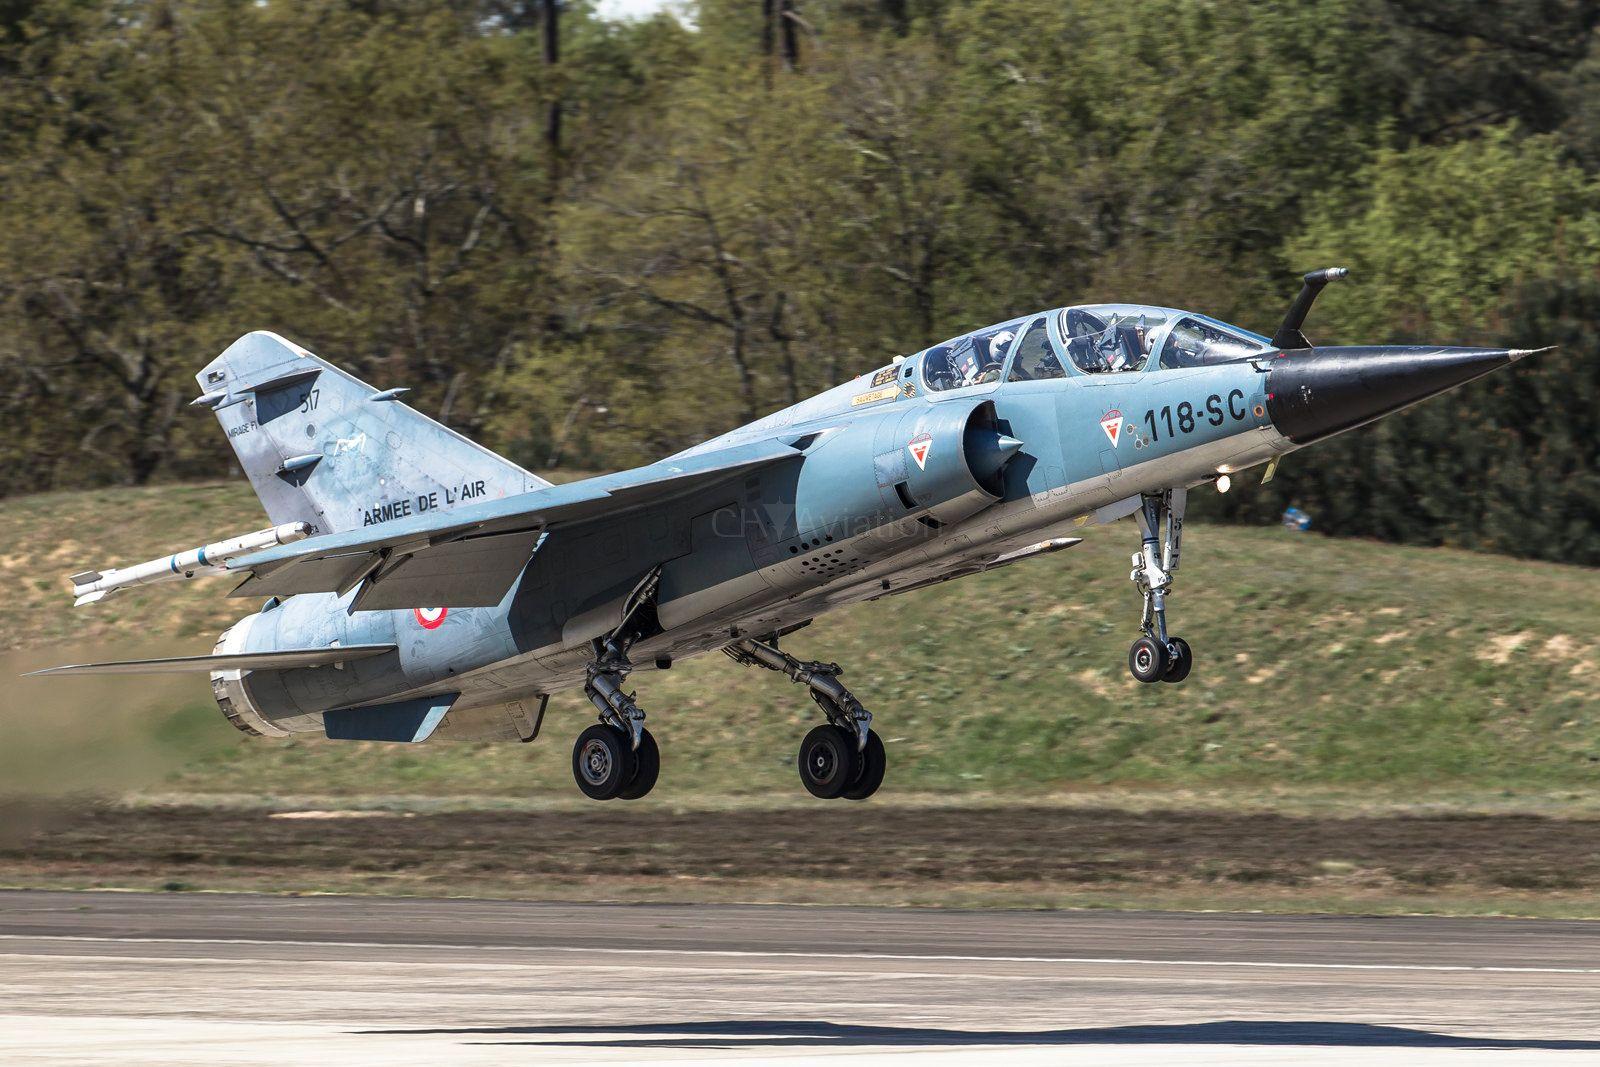 https://flic.kr/p/AC1RGS | Mirage F1-B, 517, 118-SC | Mont-de-Marsan, France